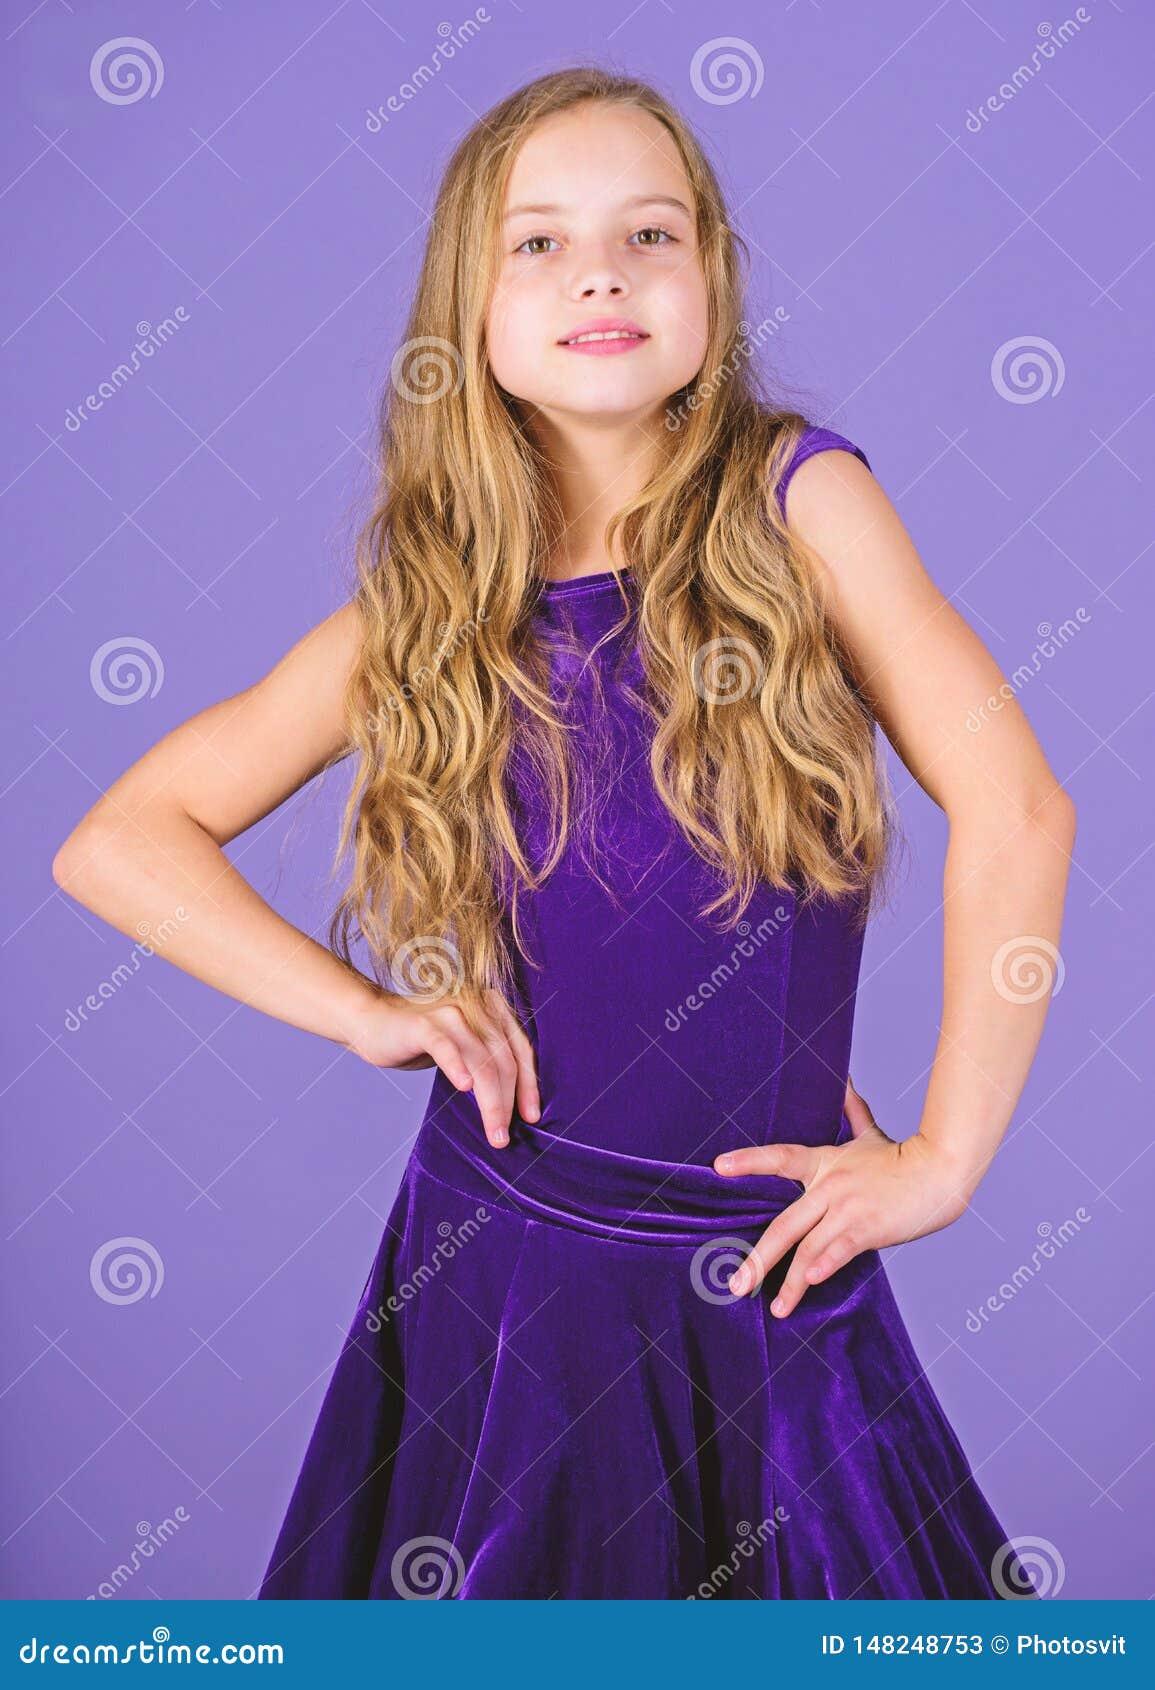 Kids fashion. Girl cute child wear velvet violet dress. Clothes for ballroom dance. Kid fashionable dress looks adorable